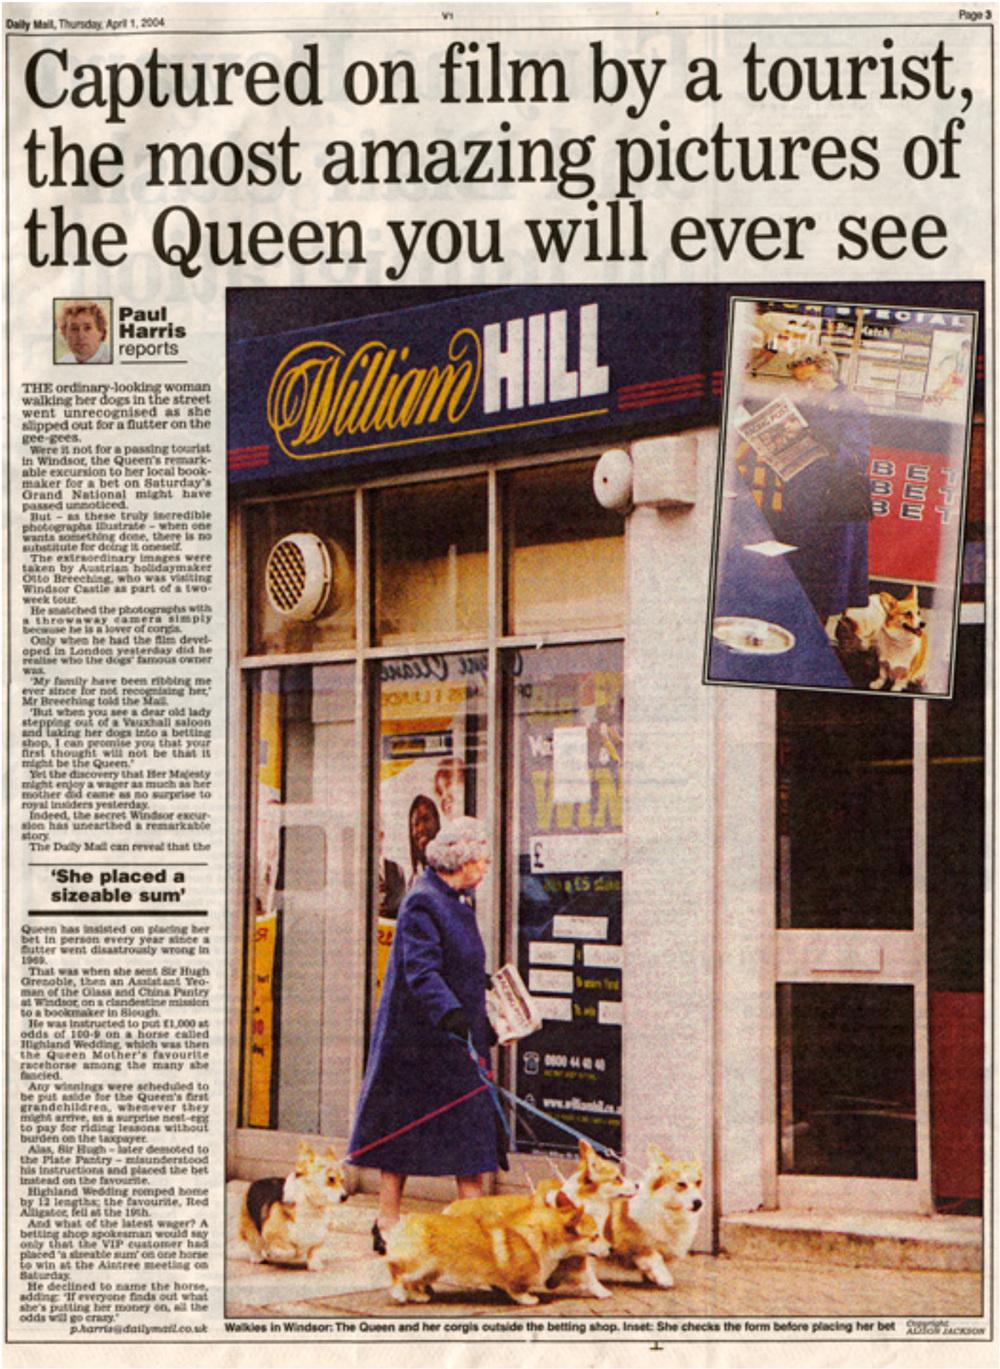 Press Queen William Hill.jpg